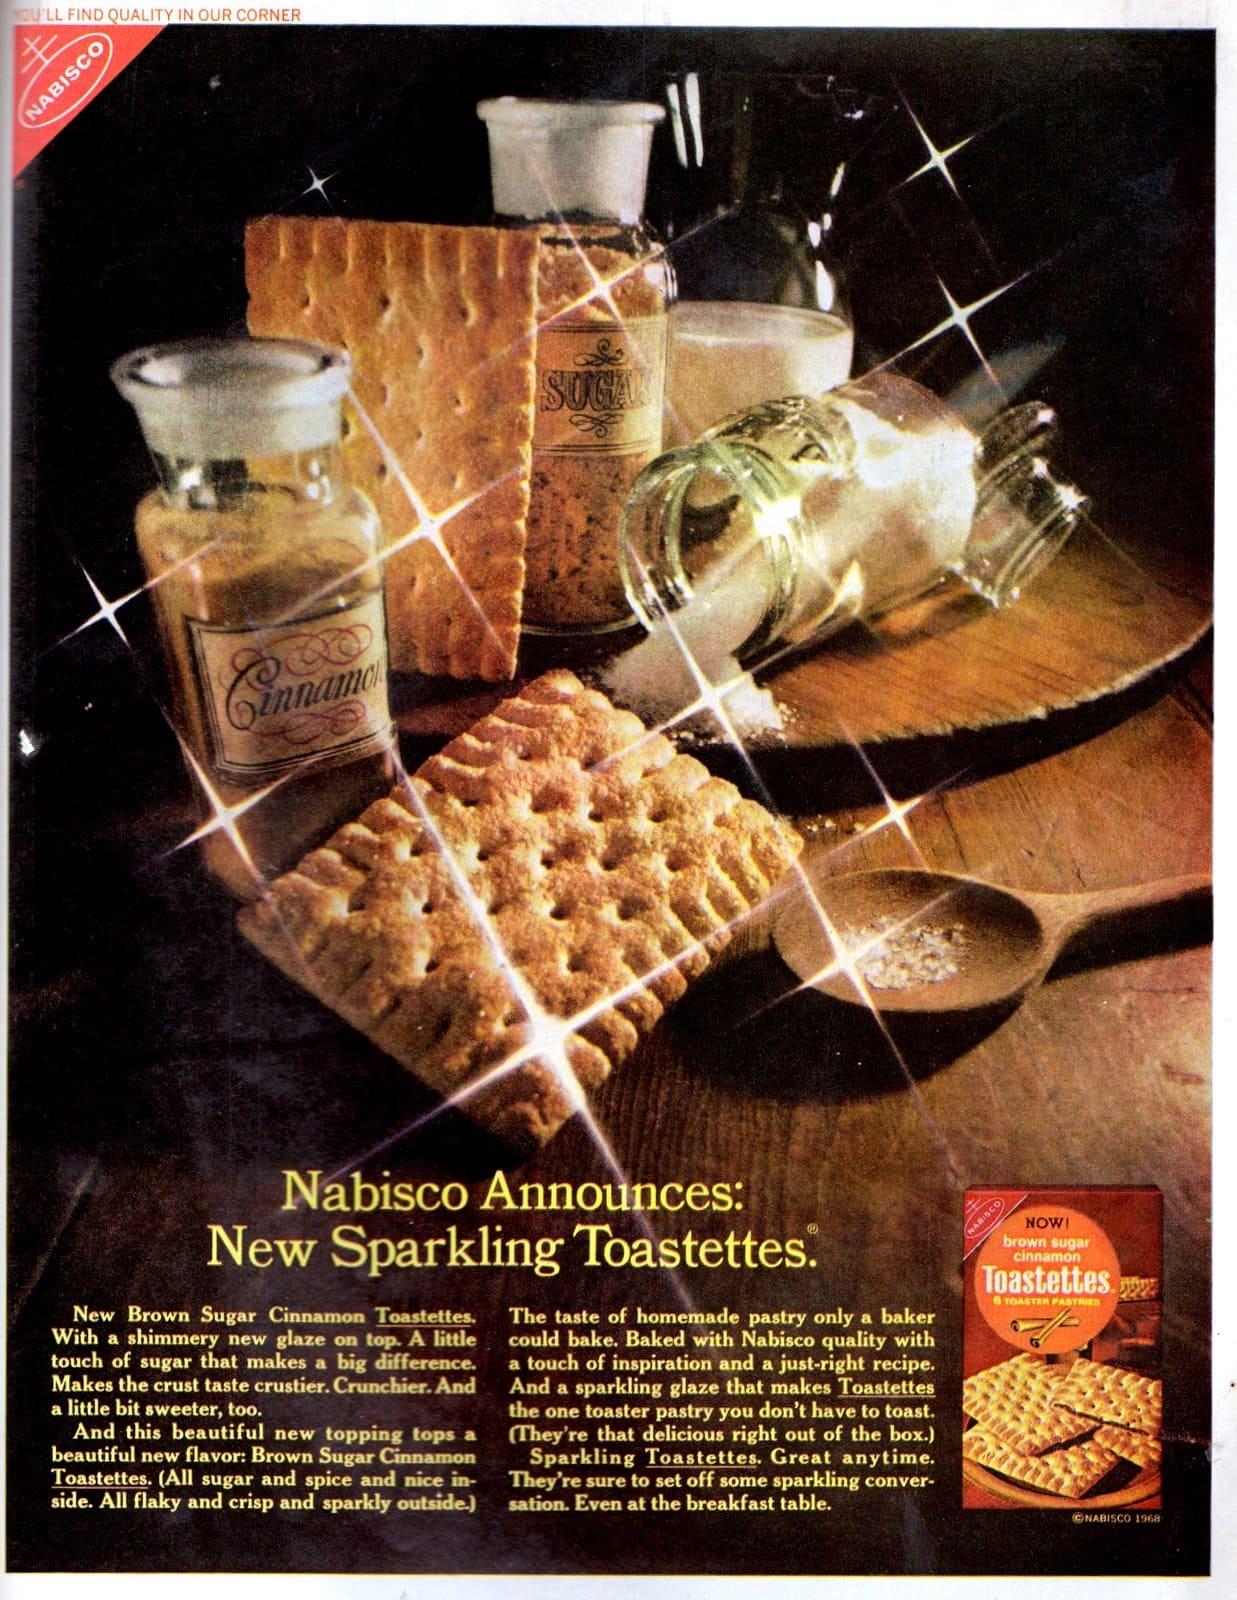 Nabisco sparkling brown sugar and cinnamon Toastettes (1968)